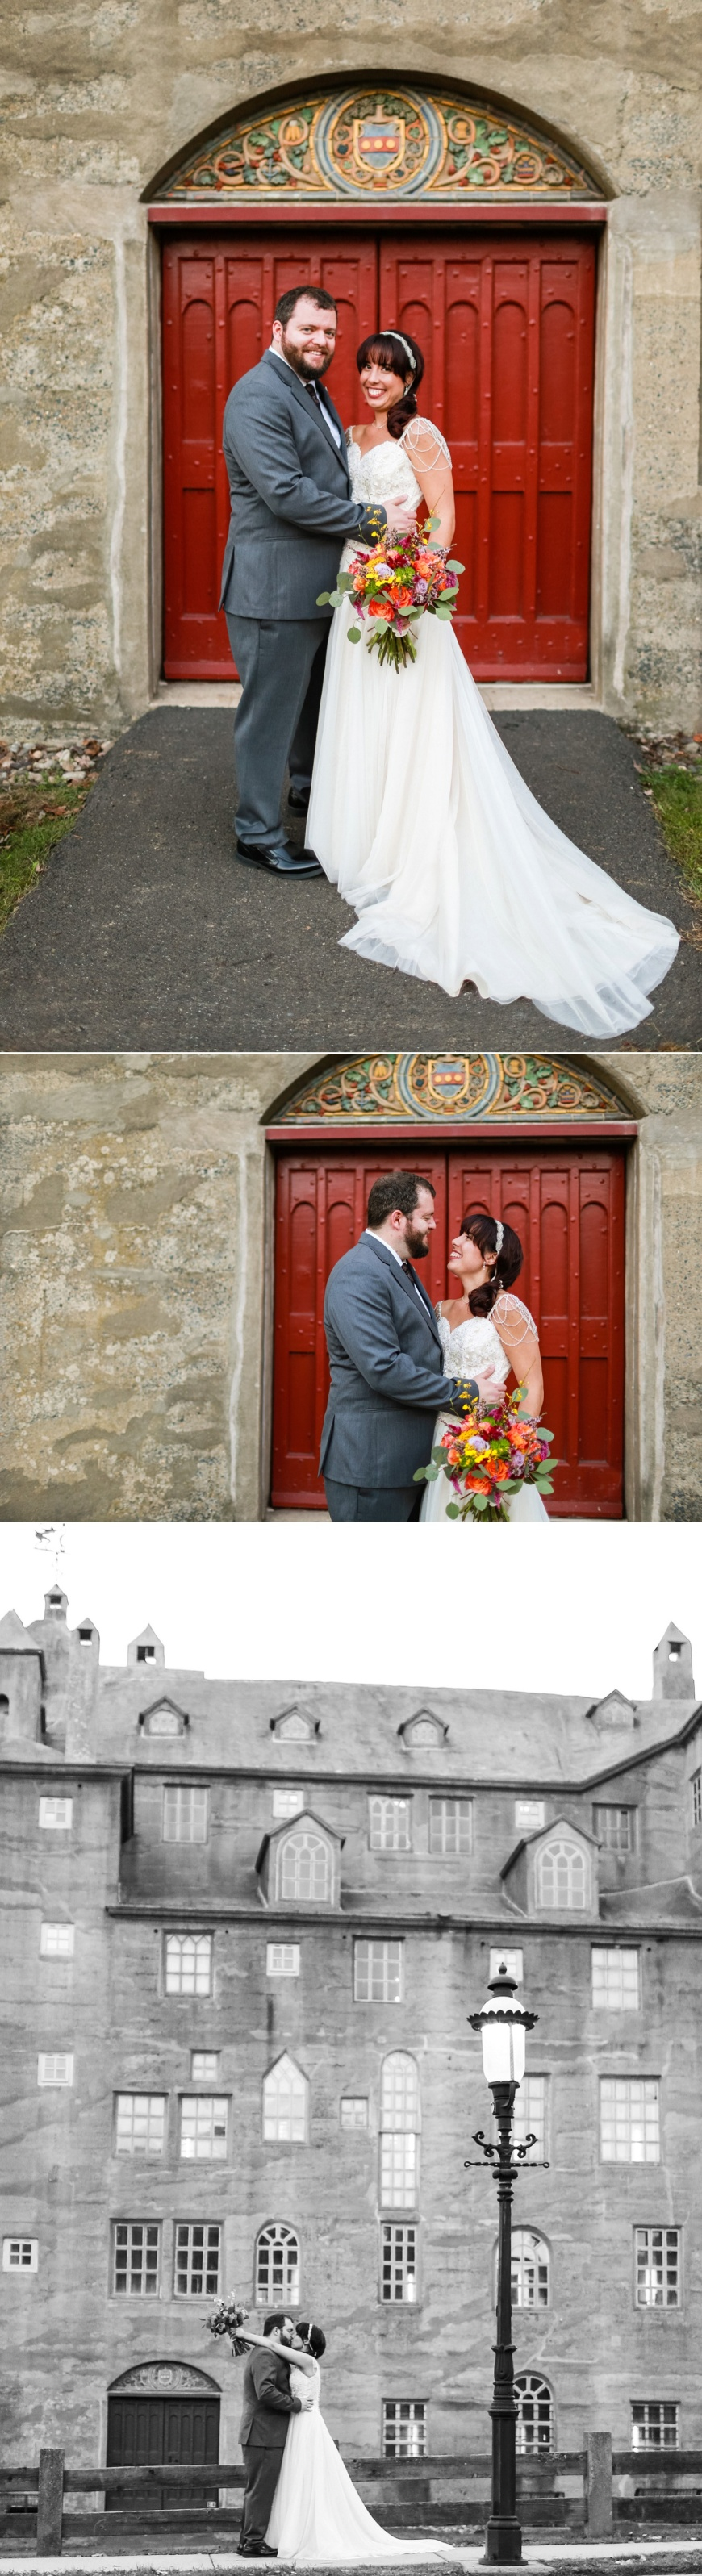 Mercer-Museum-Wedding-Photographer_1068.jpg